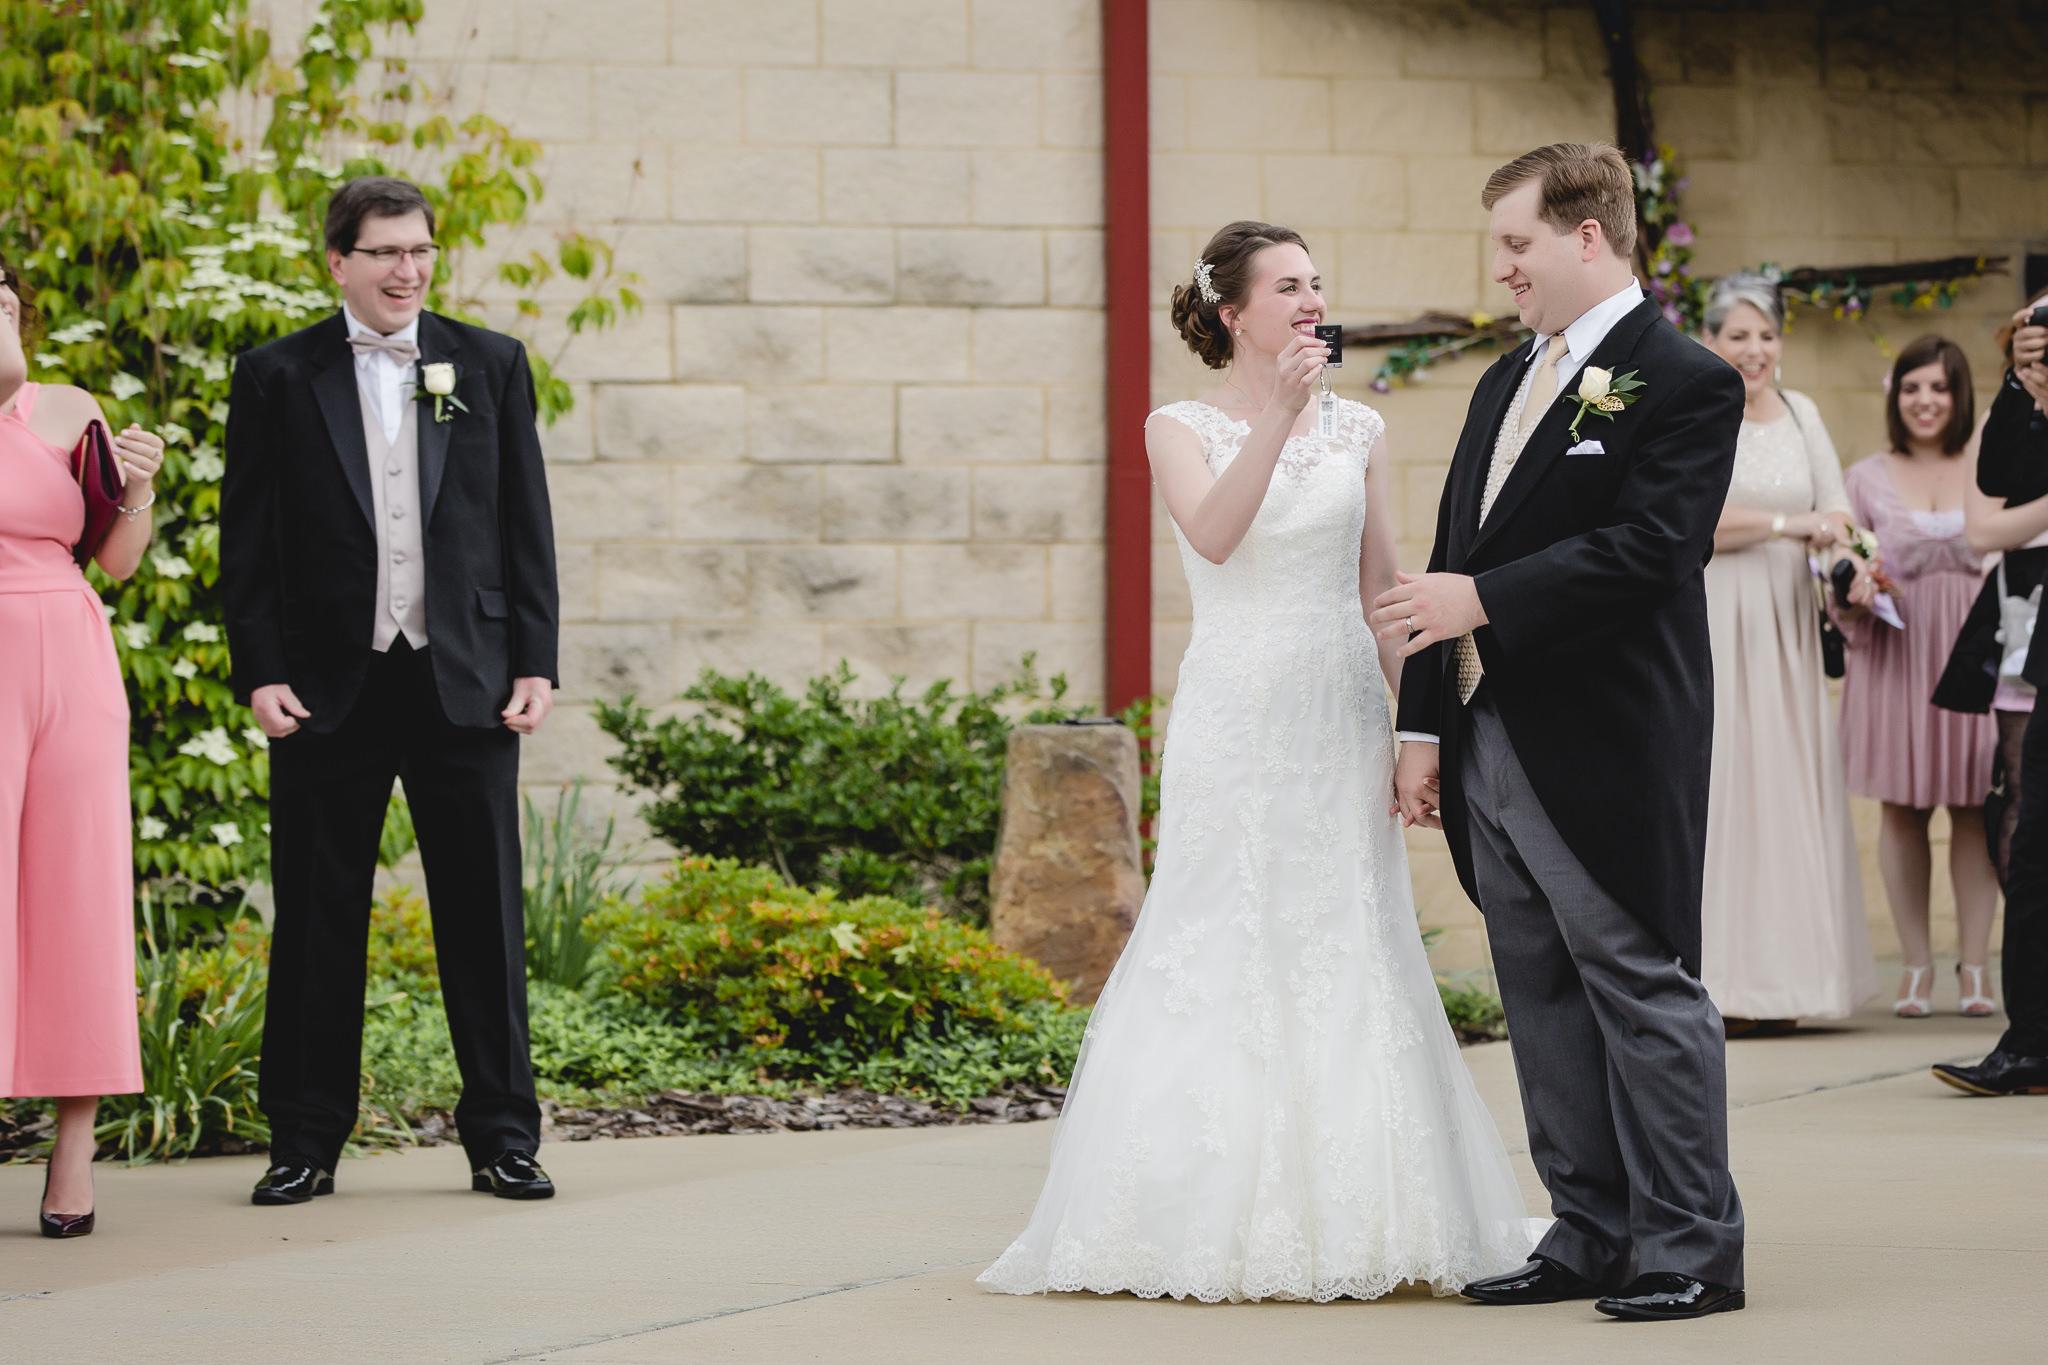 Bride gives groom keys to surprise red Corvette